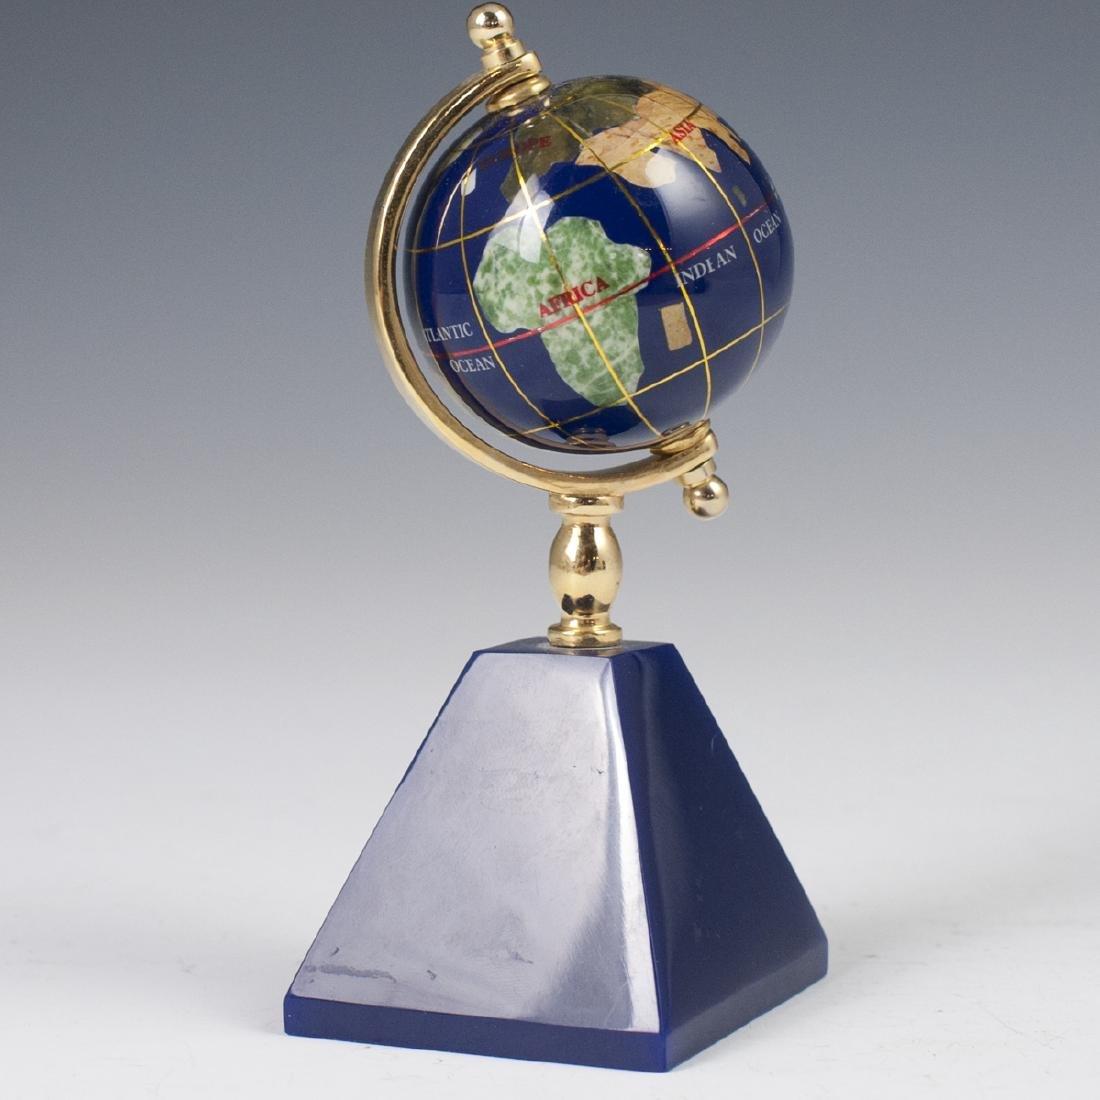 Vintage Semi-Precious Stone Globe Clock - 3